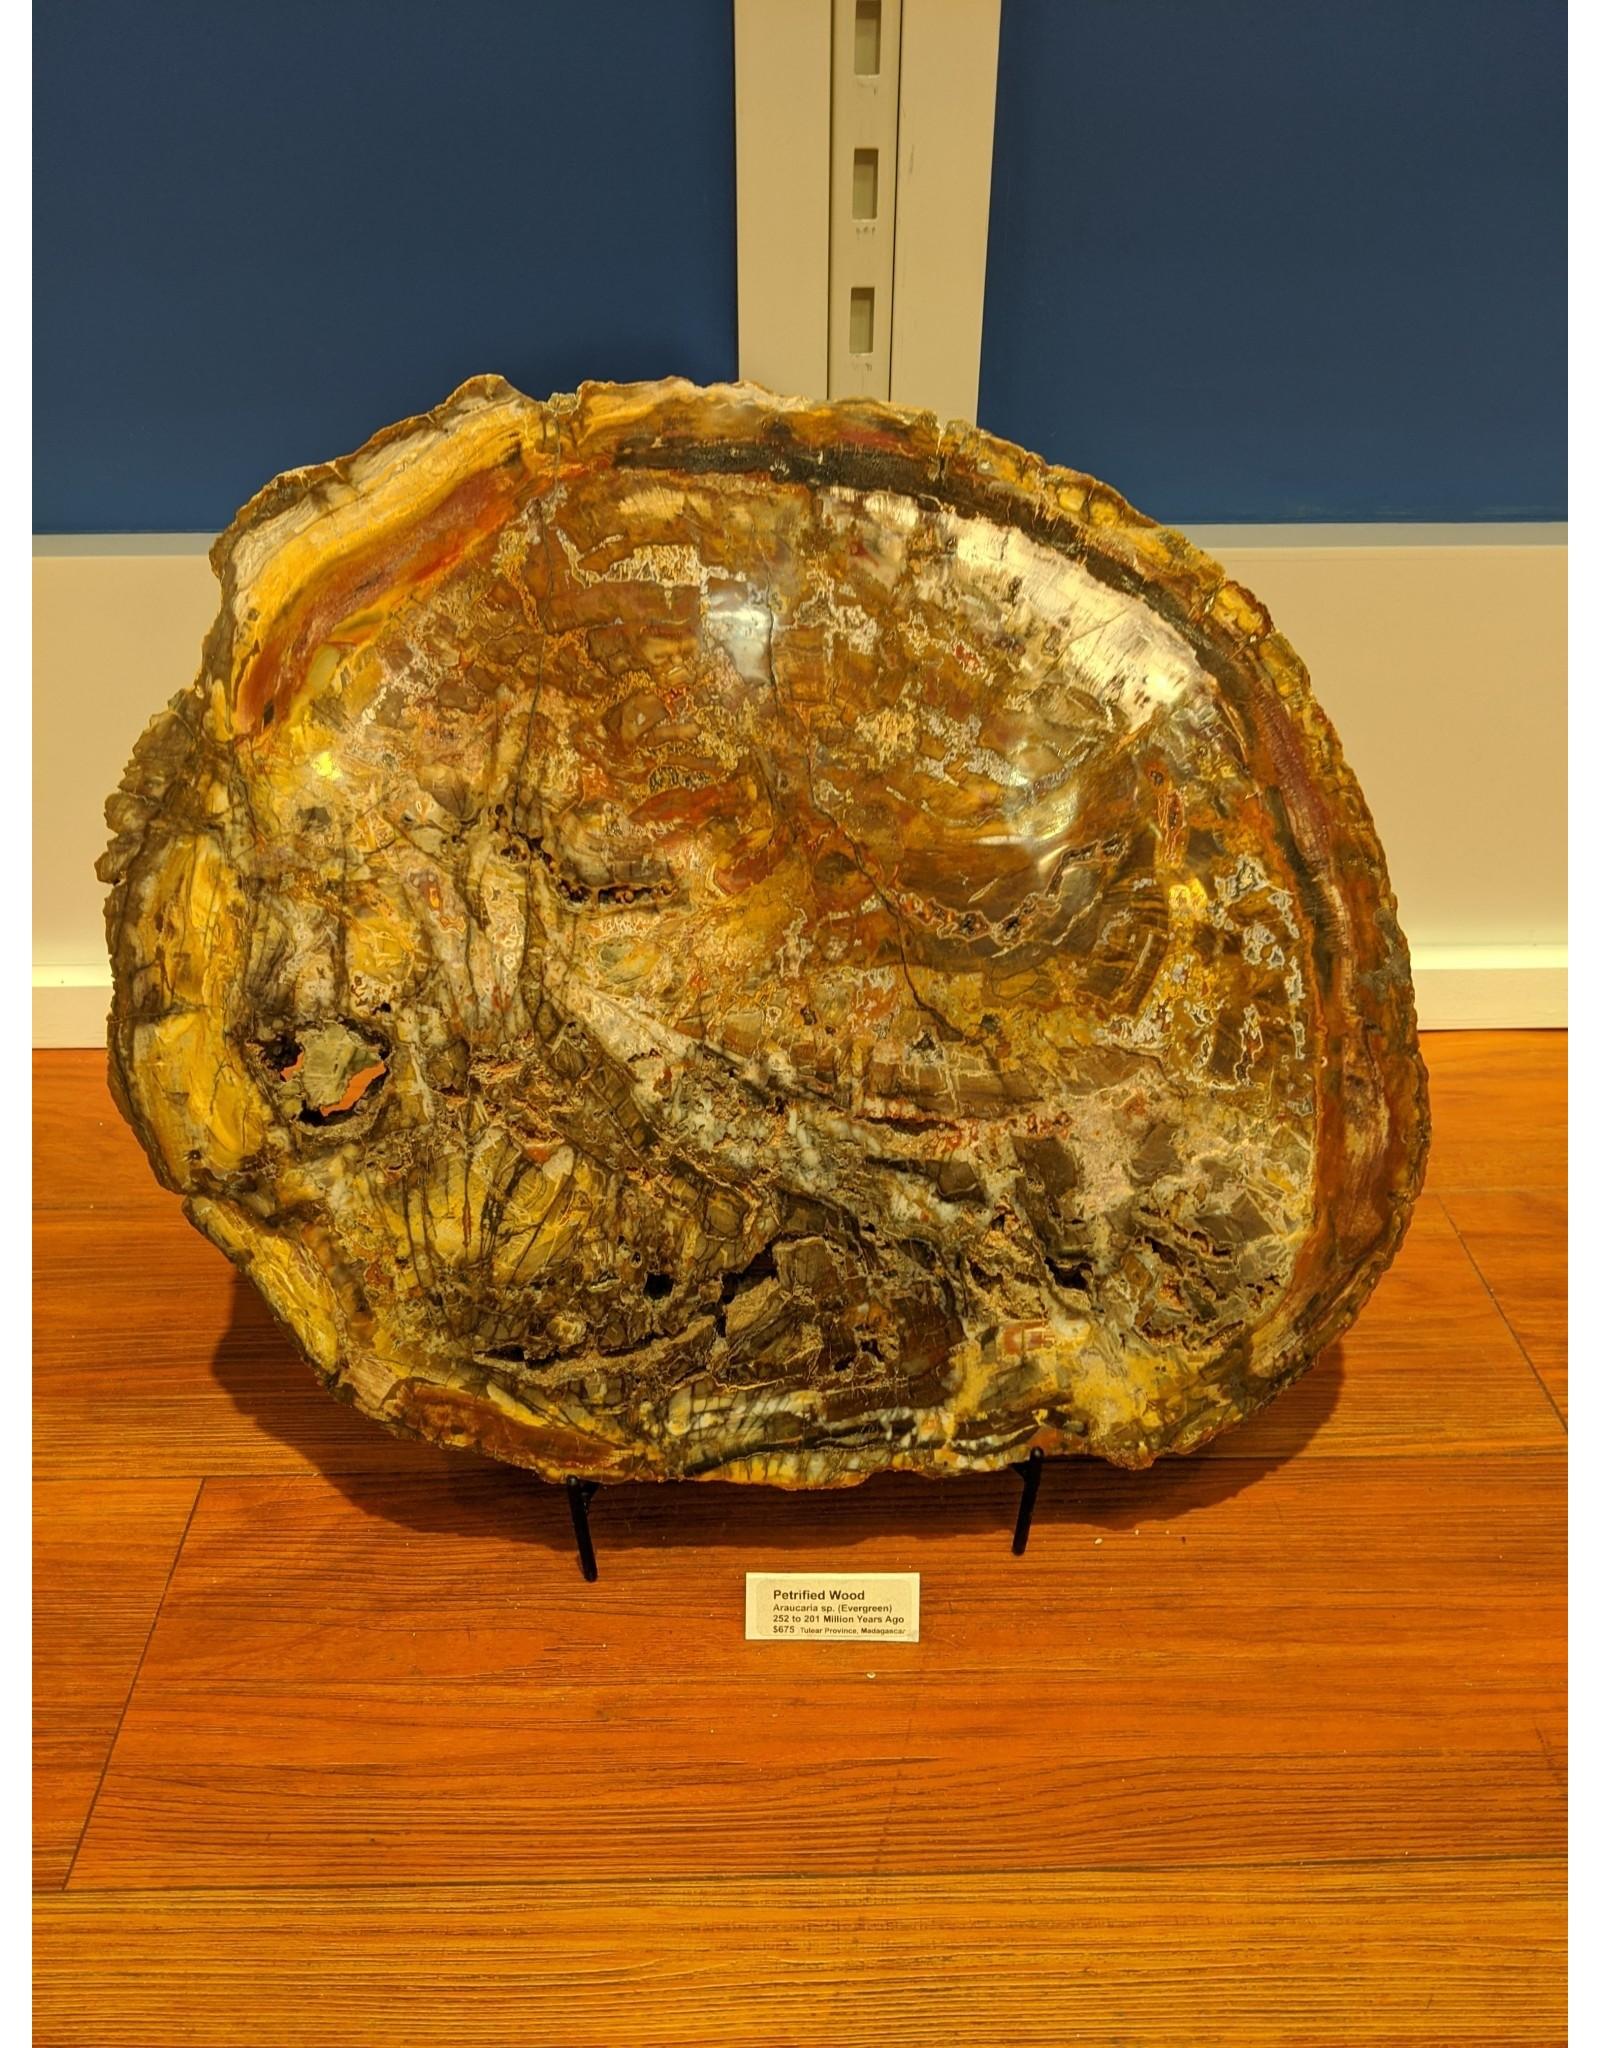 Petrified Wood Slab, Araucaria Sp.  252-201 MYA (Tulear Province, Madagascar)